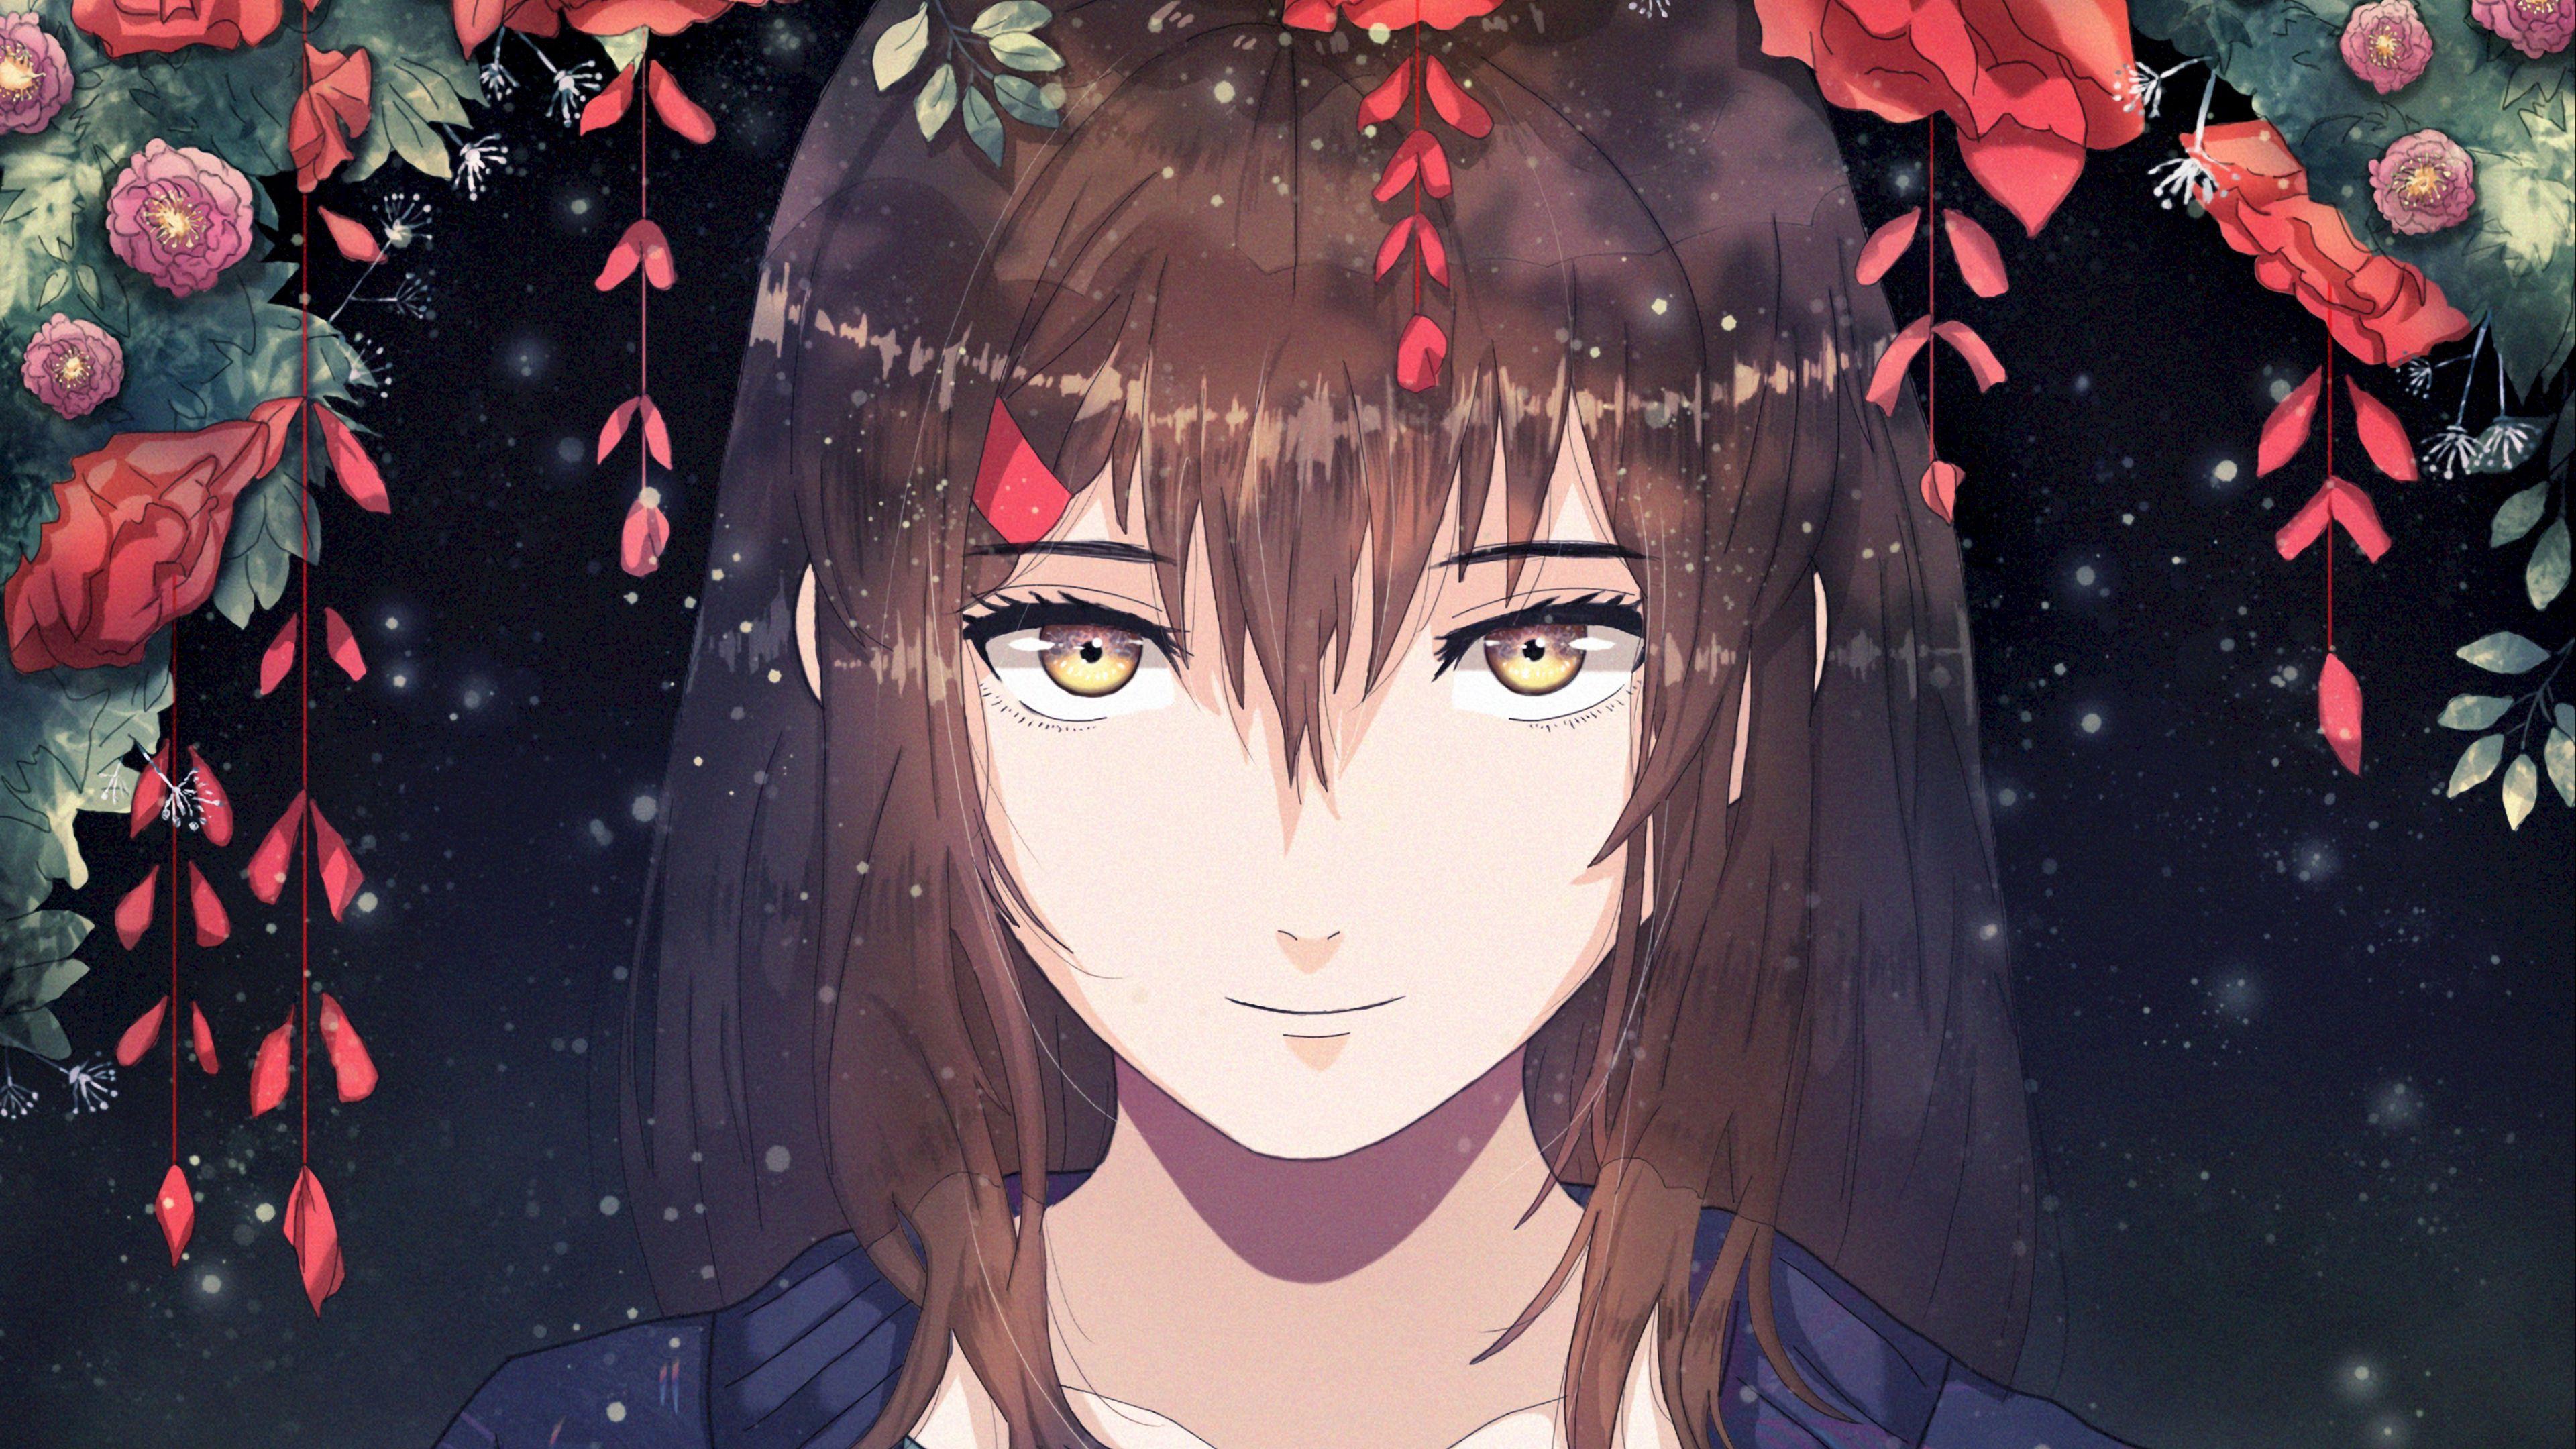 Download wallpaper 3840x2160 girl, anime, smile, sweet